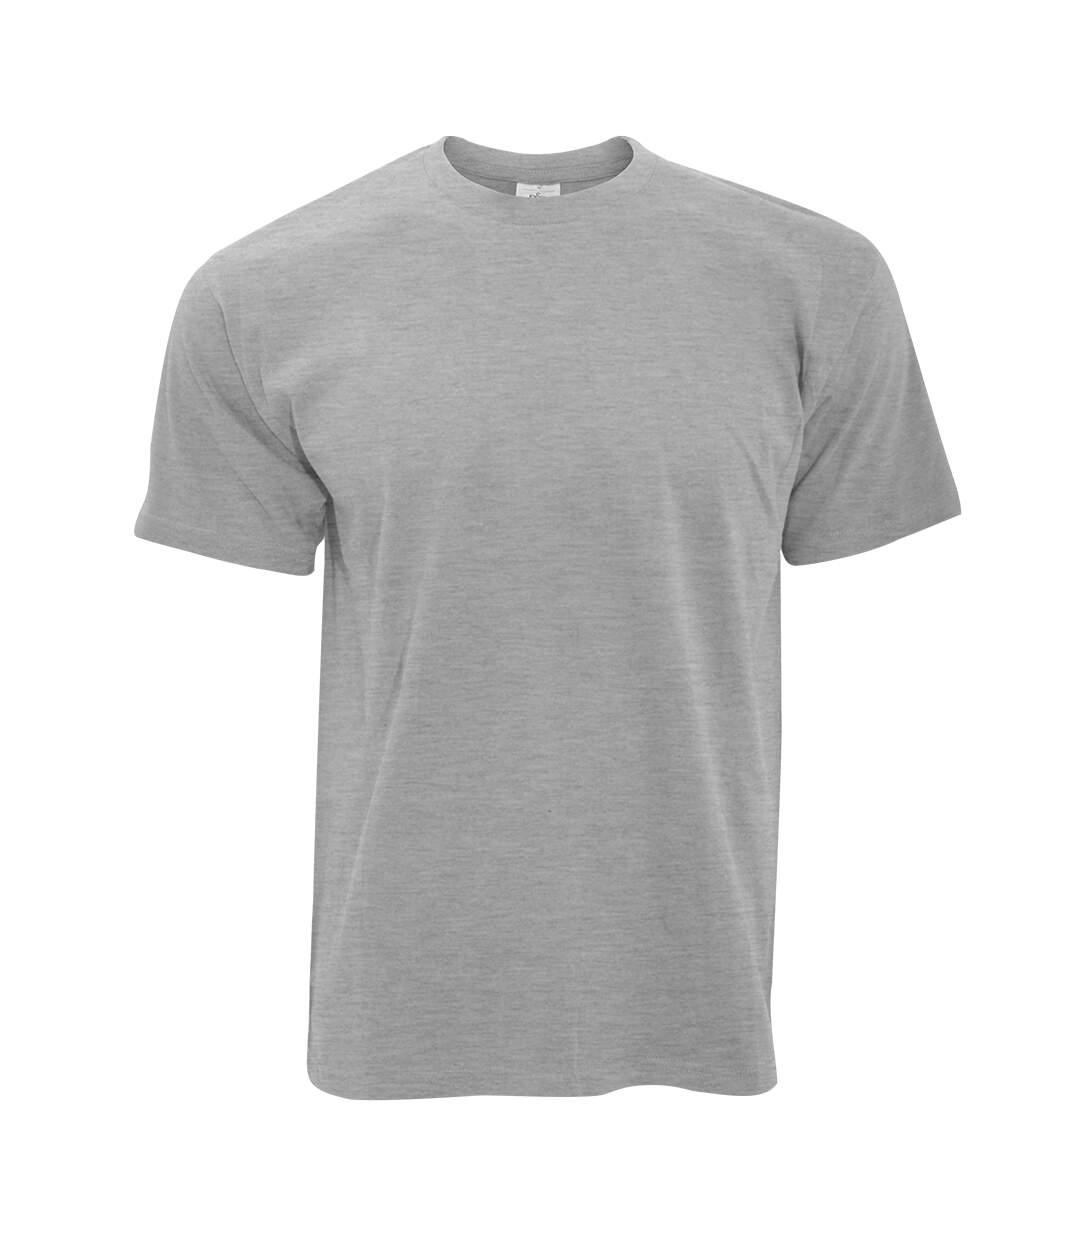 B&C Exact 190 Mens Crew Neck T-Shirt / Mens Short Sleeve T-Shirt (Sport Grey) - UTBC125